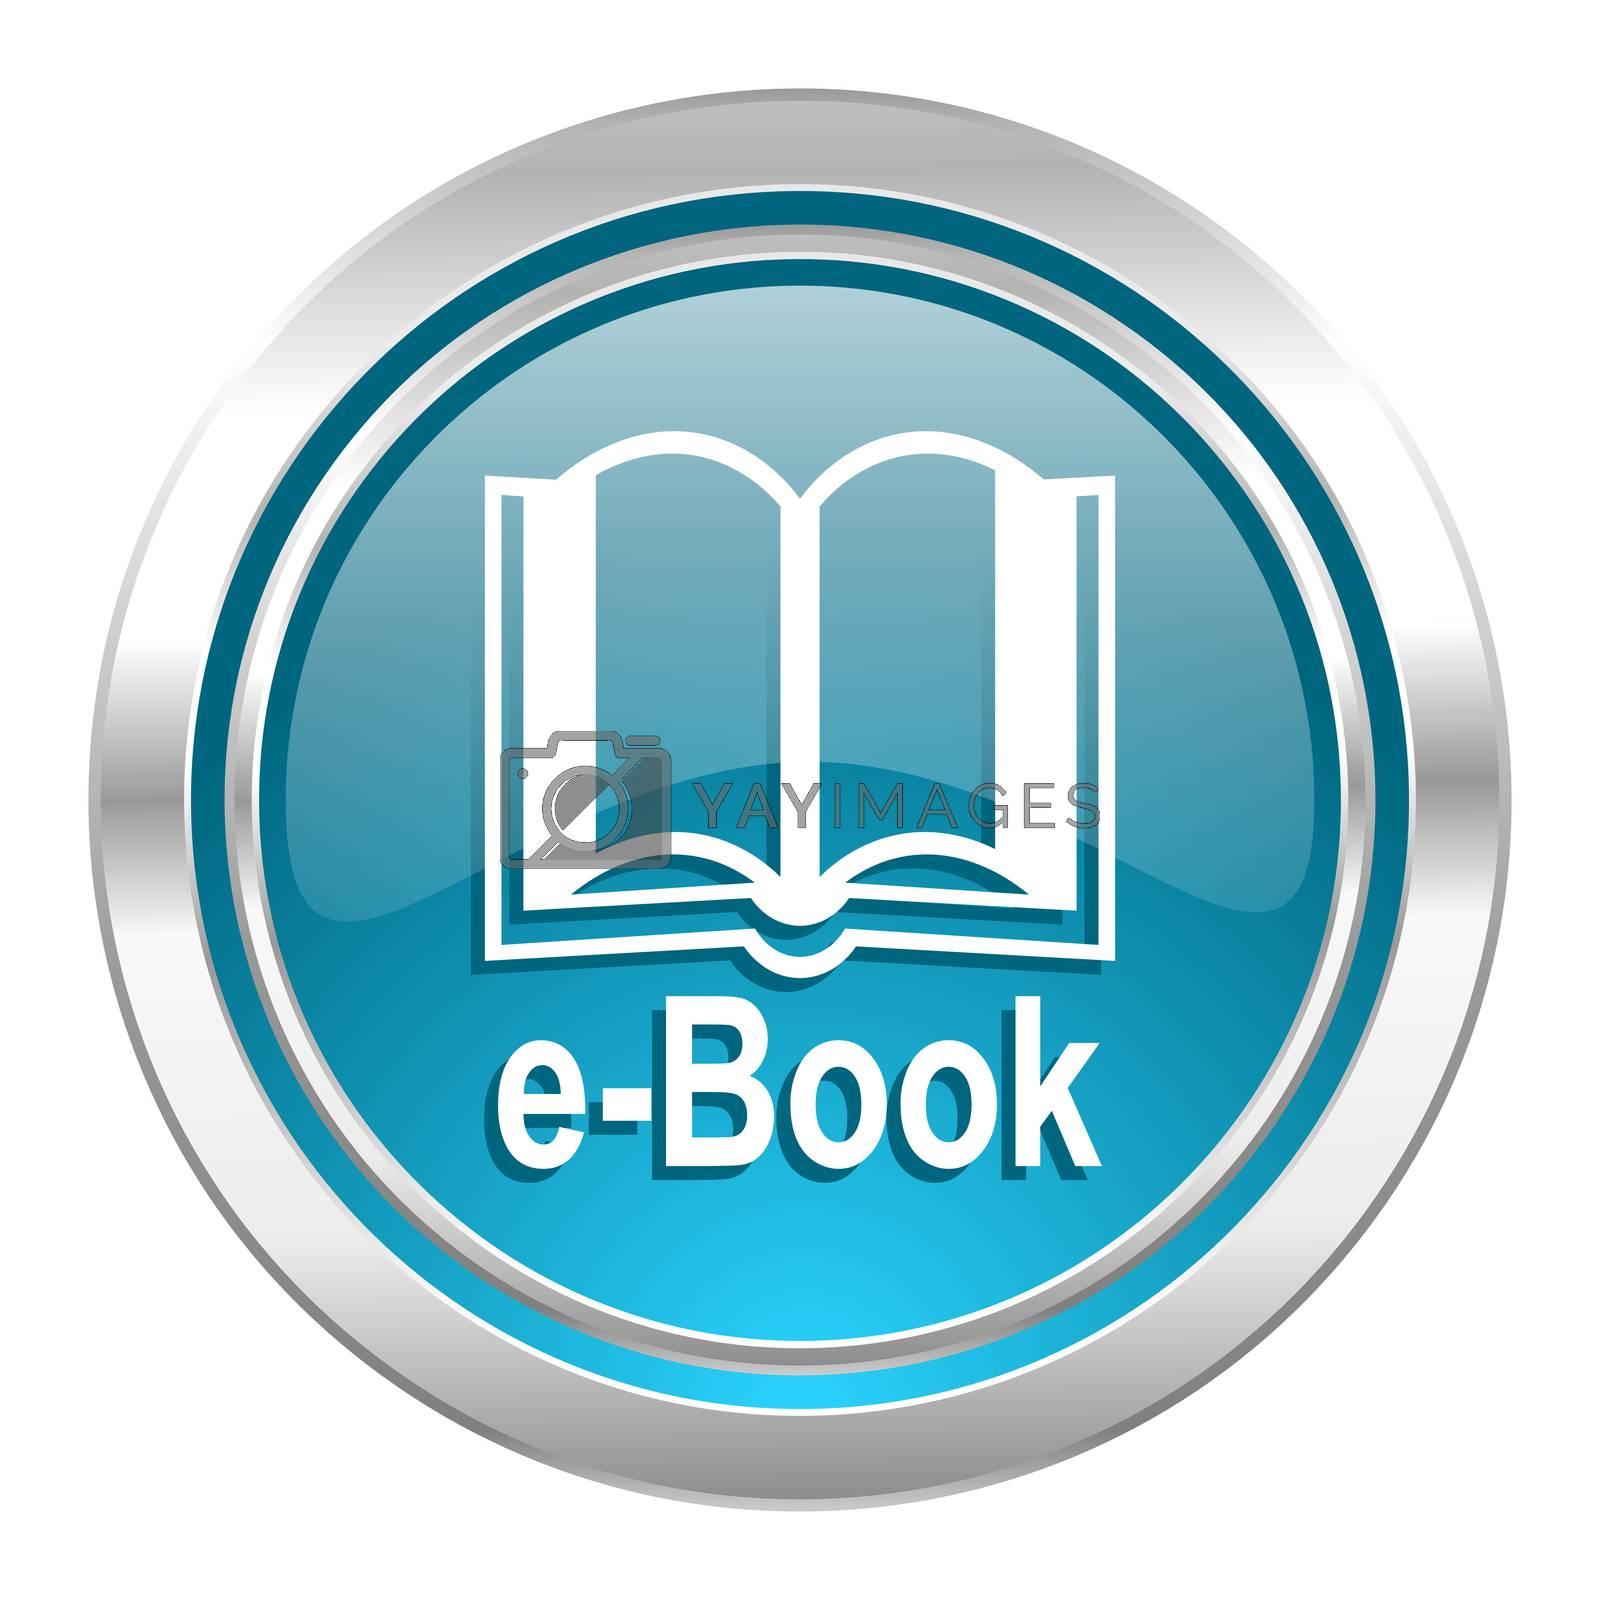 book icon, e-book sign